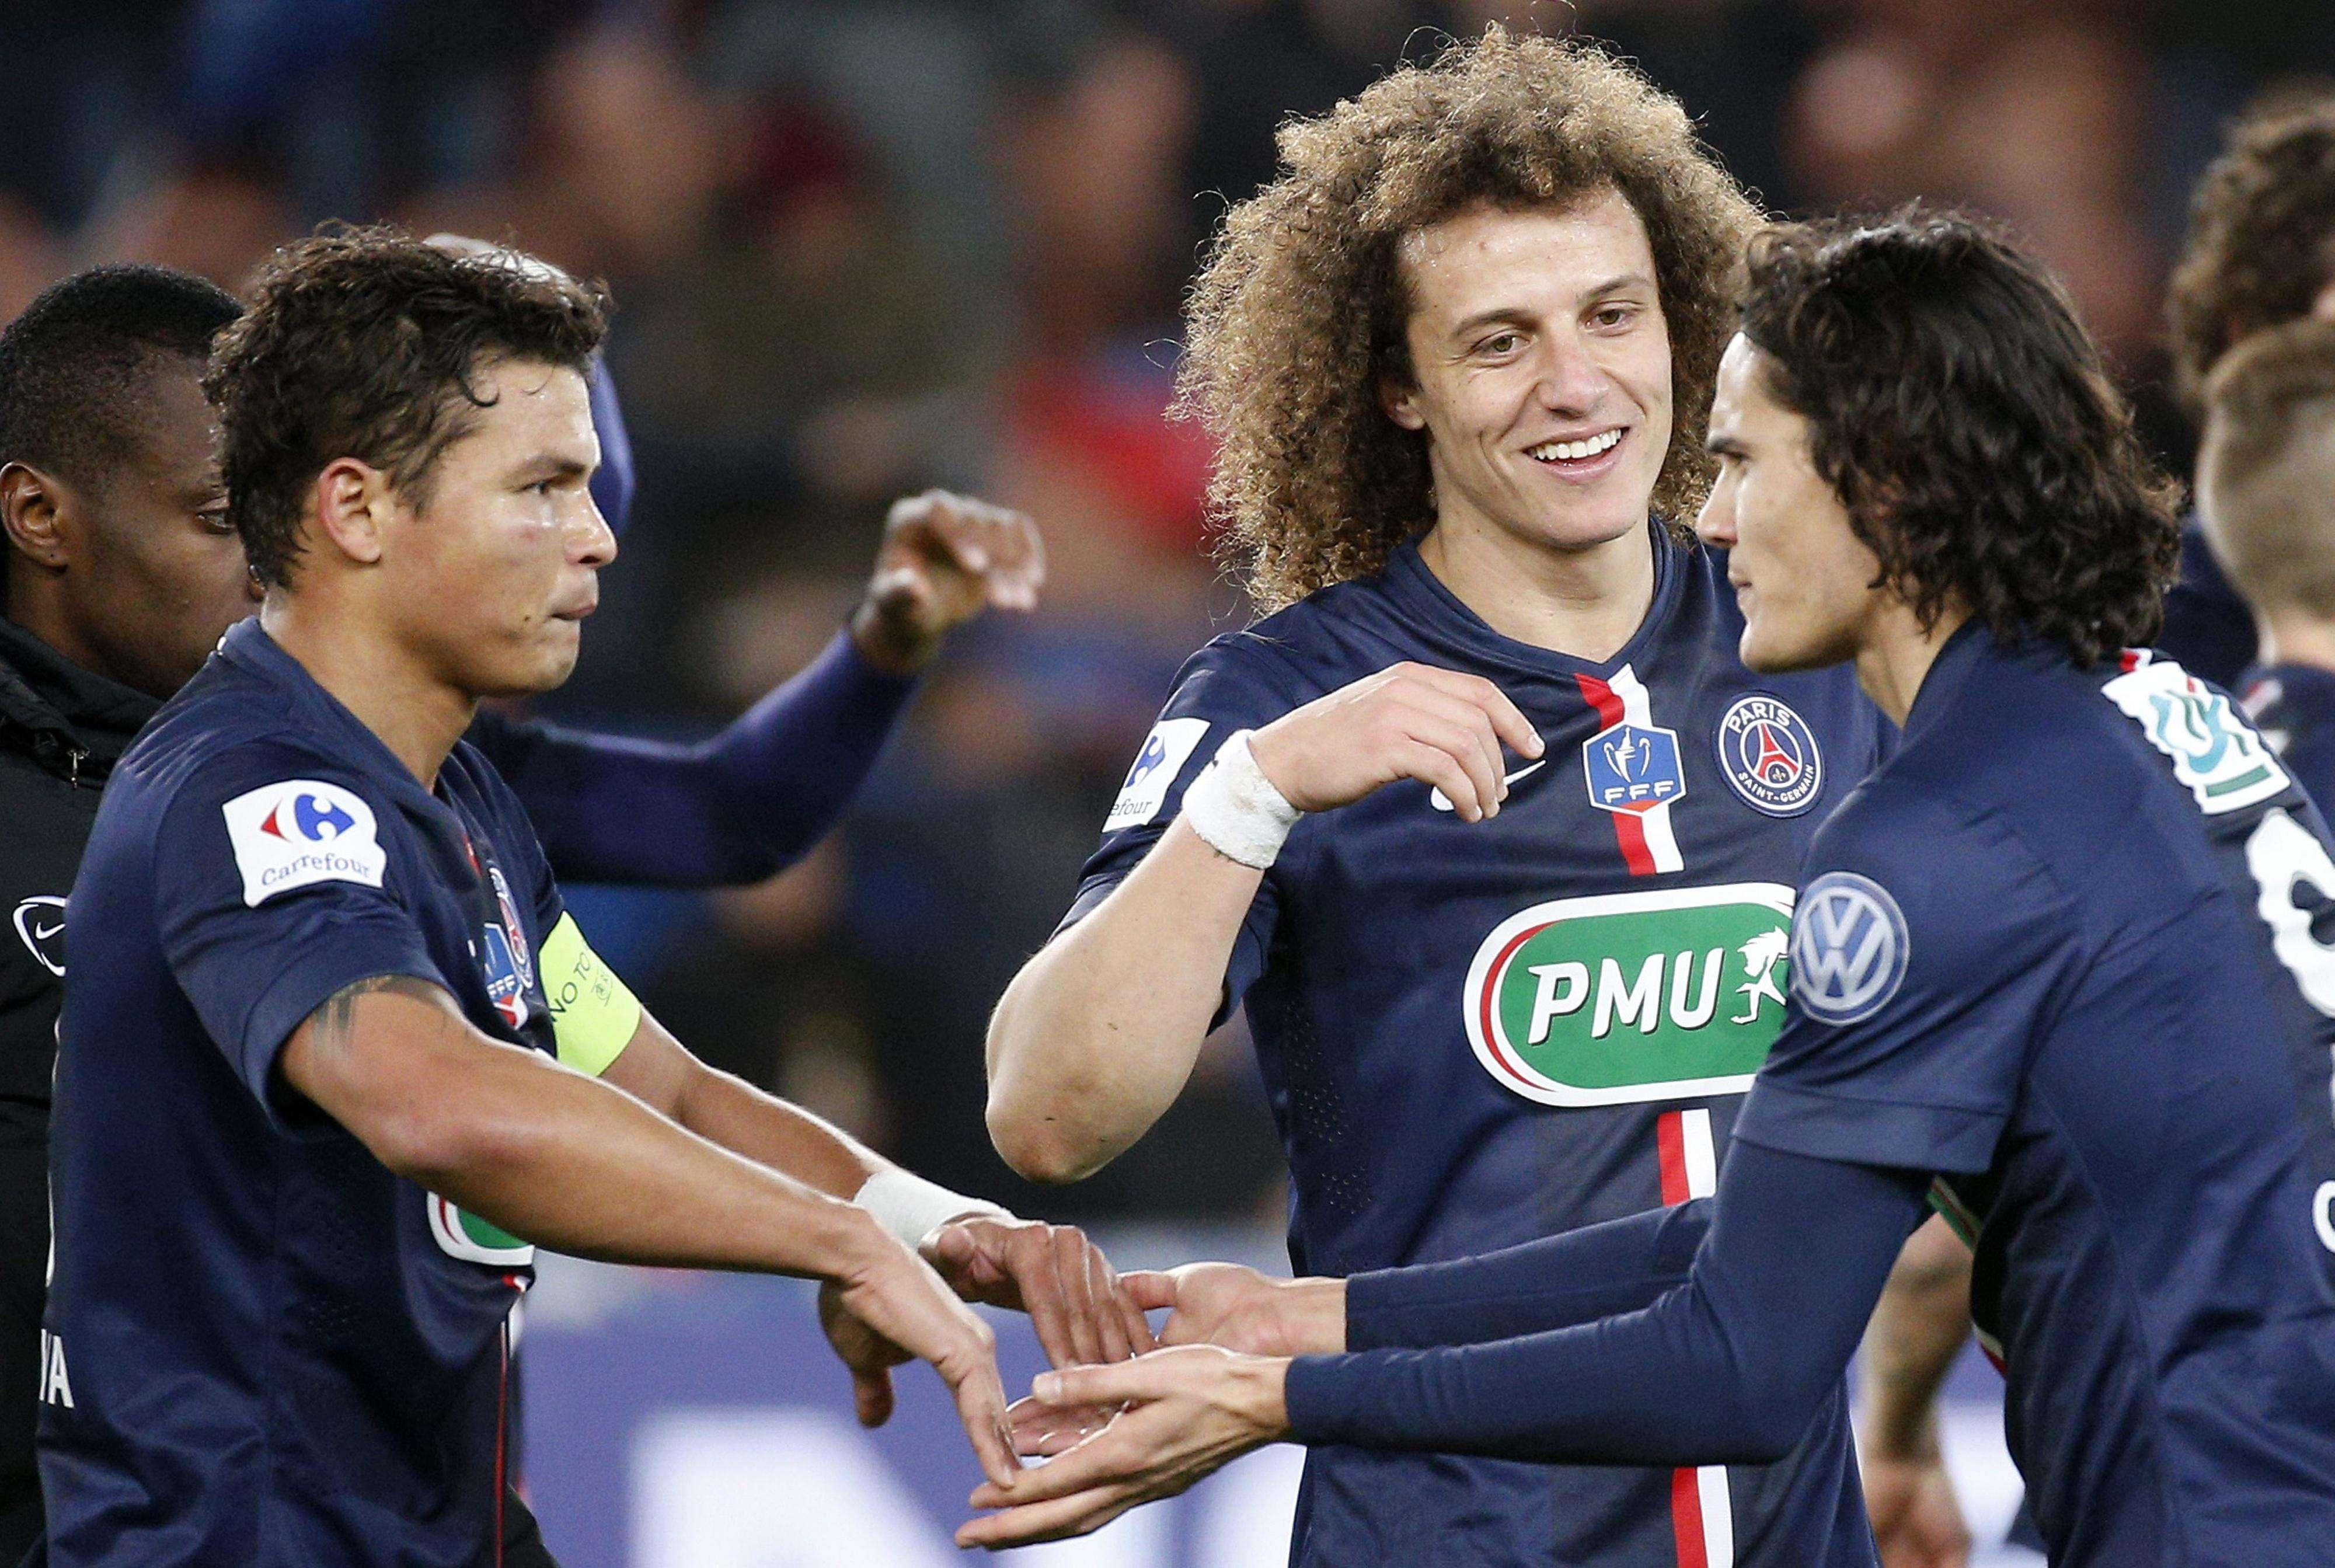 PSG festeja gol contra Monaco Foto: Yoan Valat/Reuters